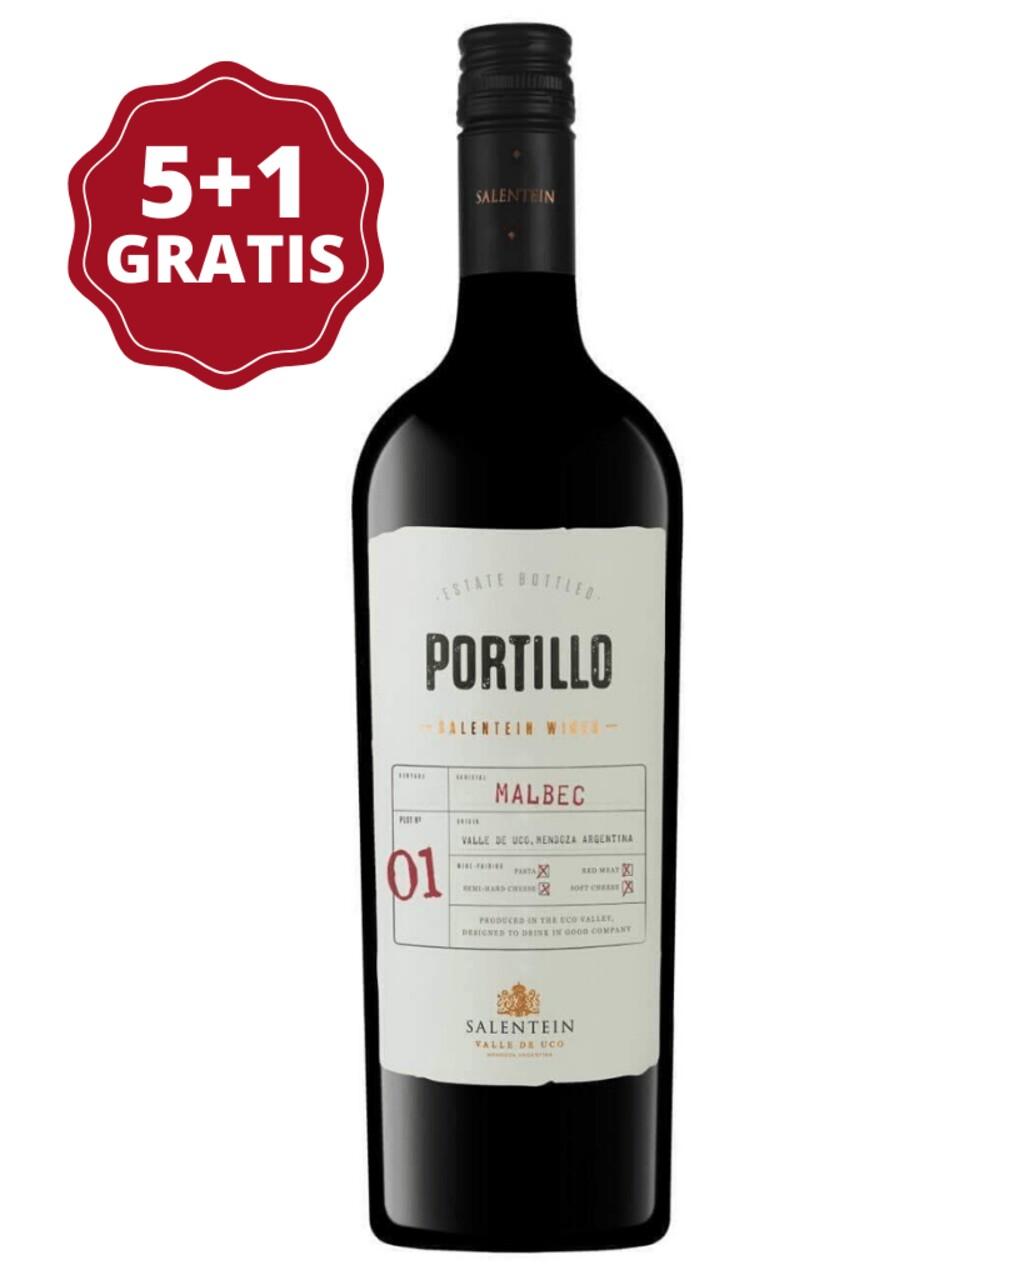 Salentein Portillo Malbec 5+1